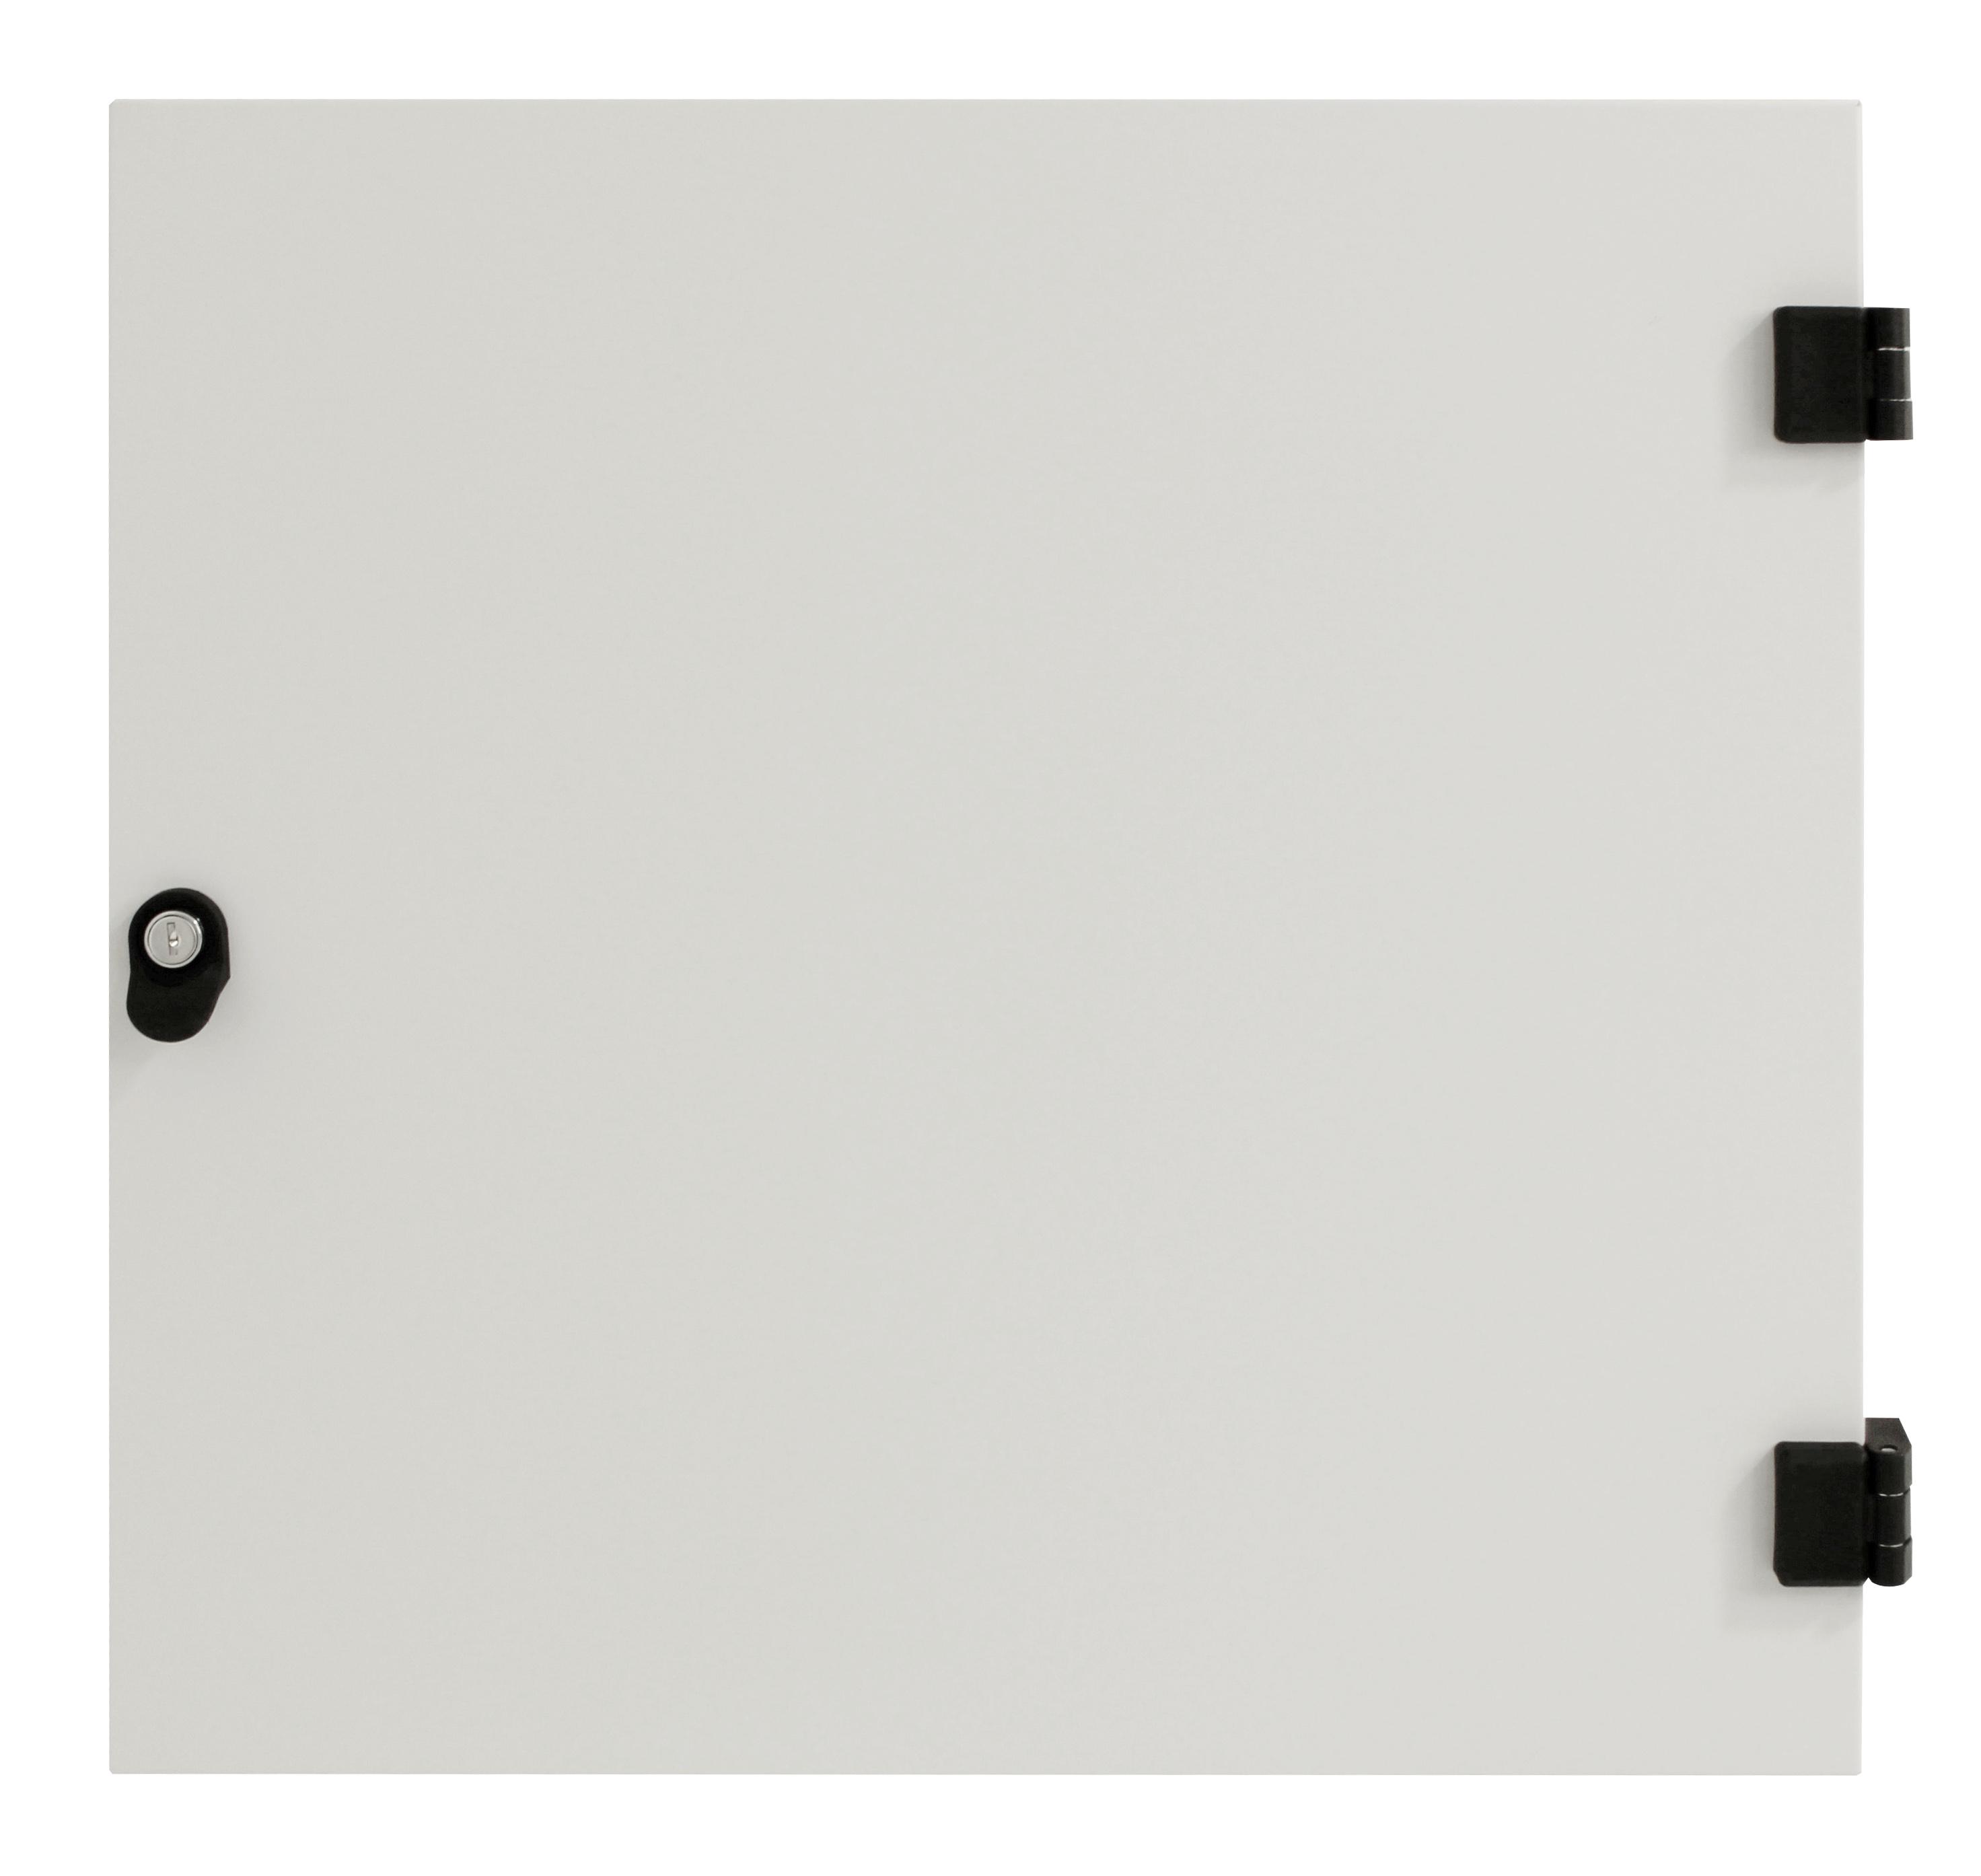 1 Stk Metall-Tür voll für DW-Schrank 21HE, B=600, RAL7035 DWRT2160--